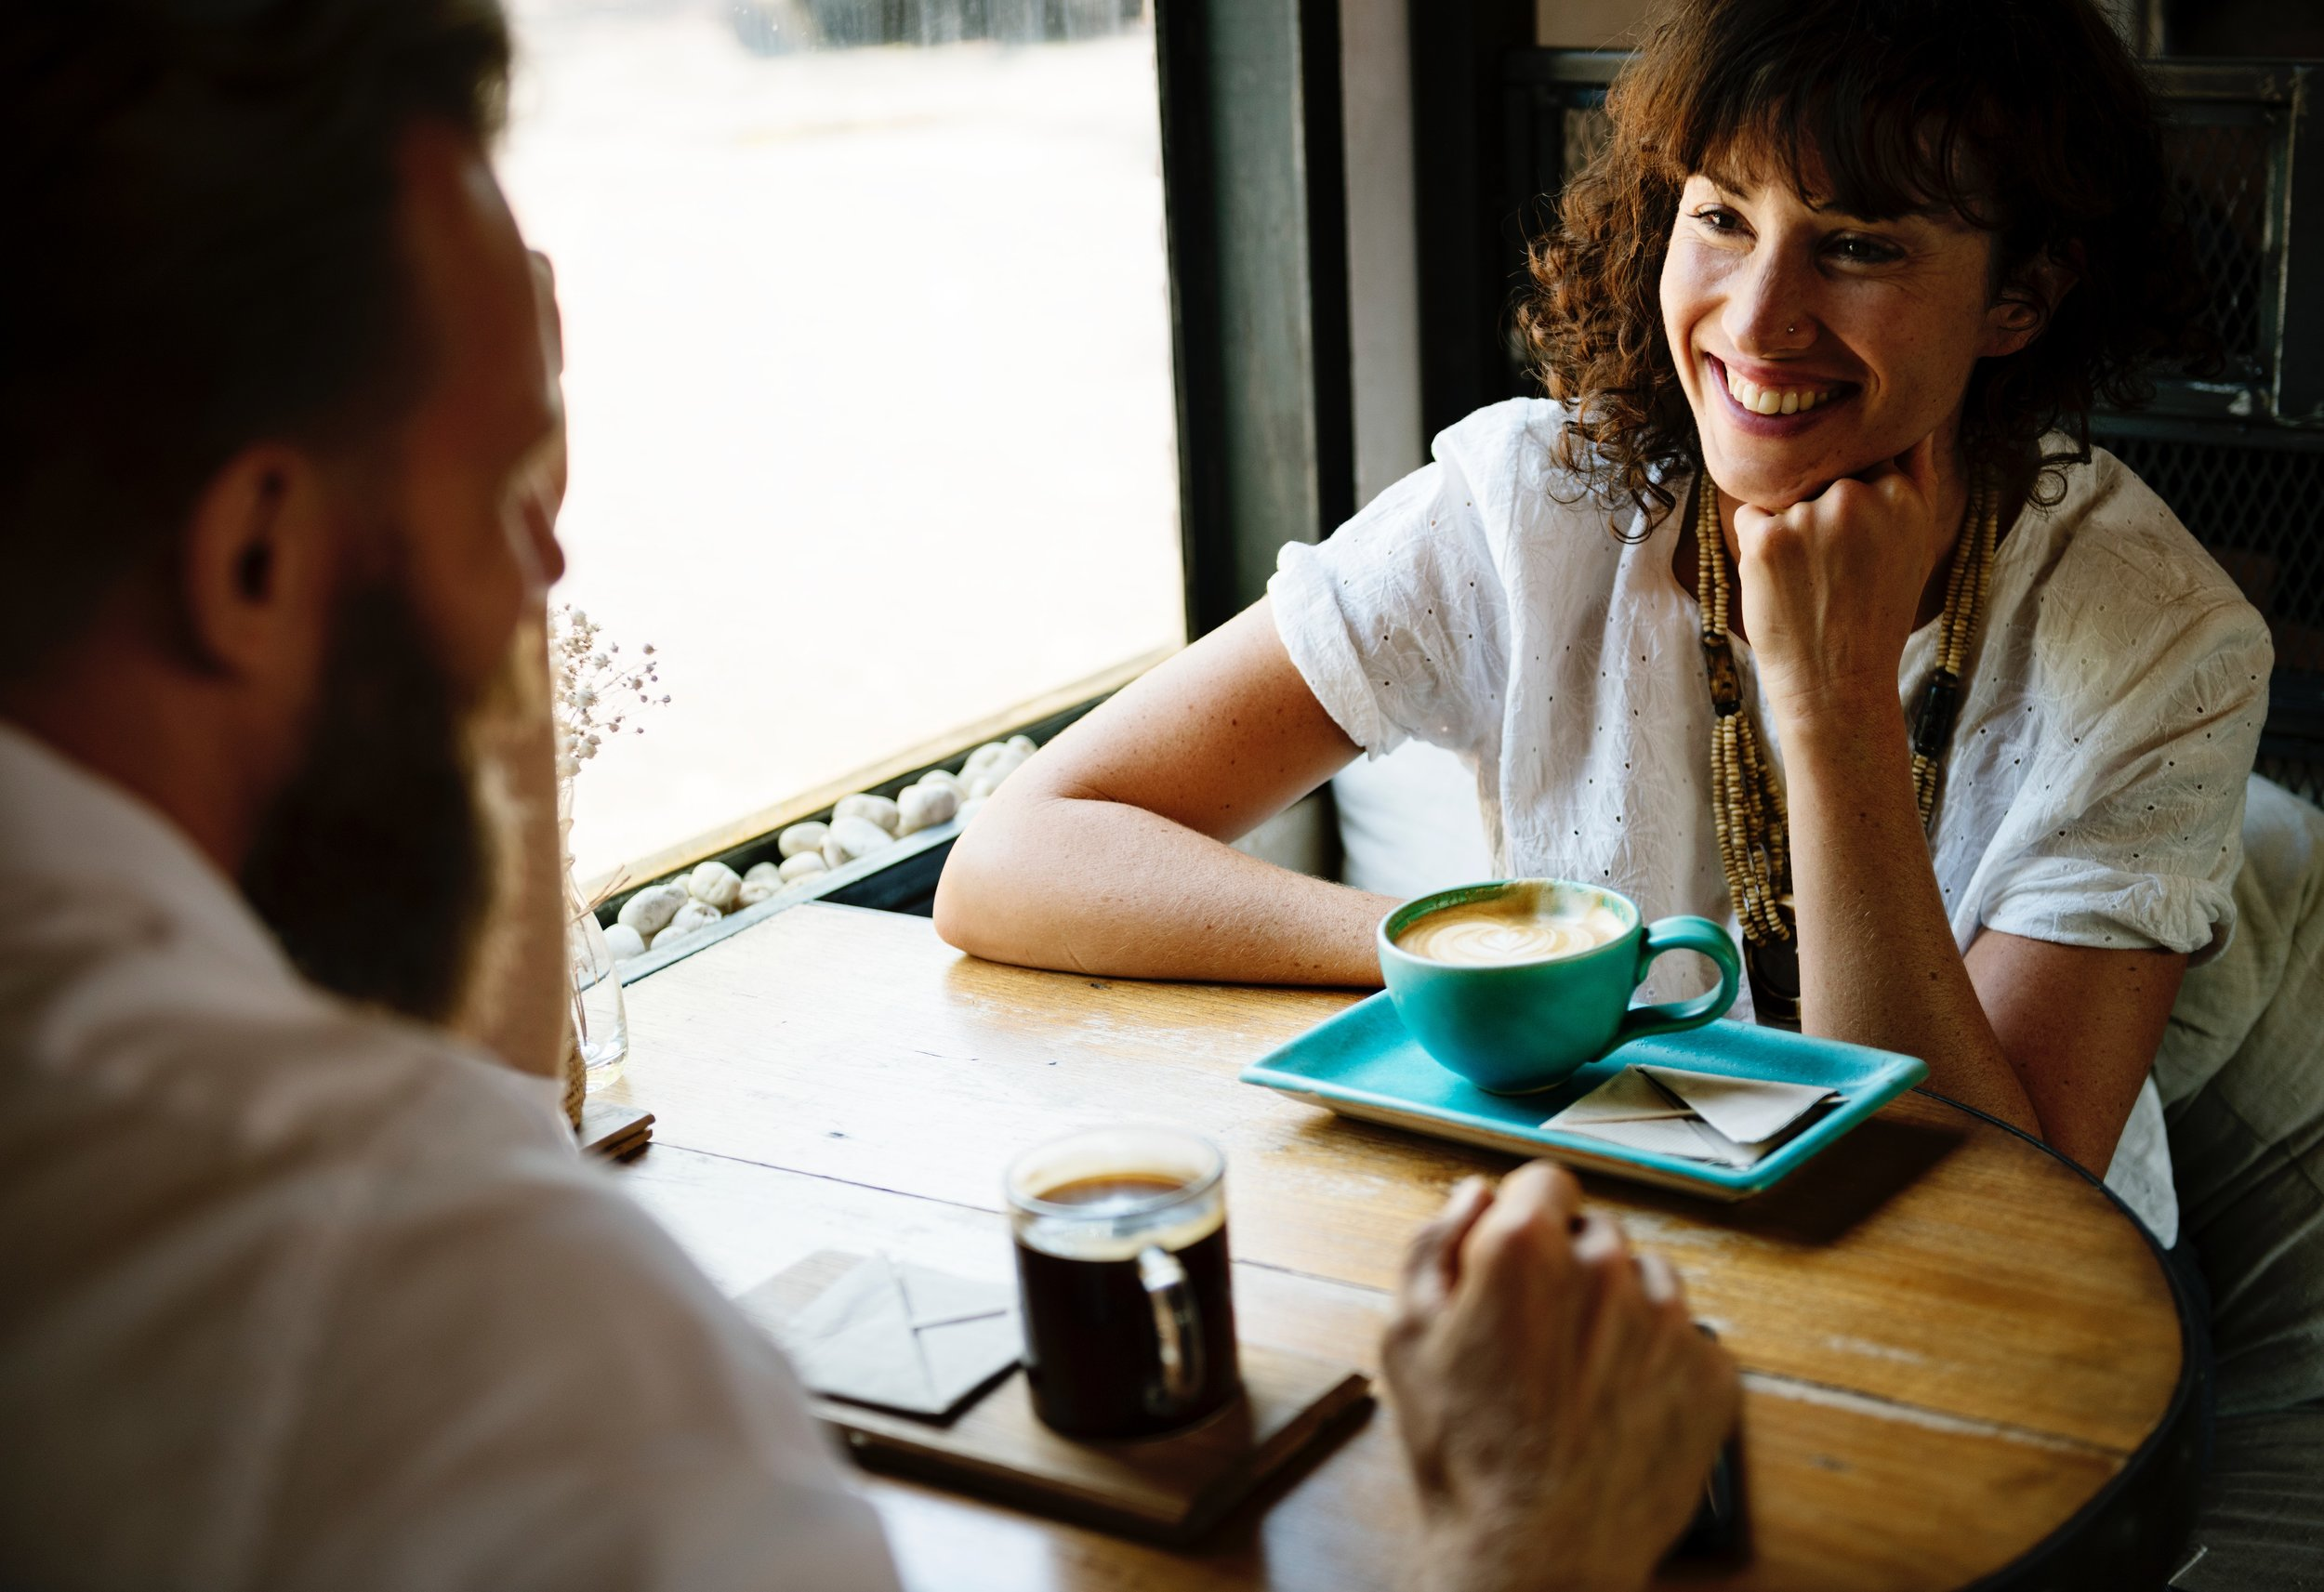 Photo credit:https://www.pexels.com/photo/beard-beverages-break-cafe-630831/